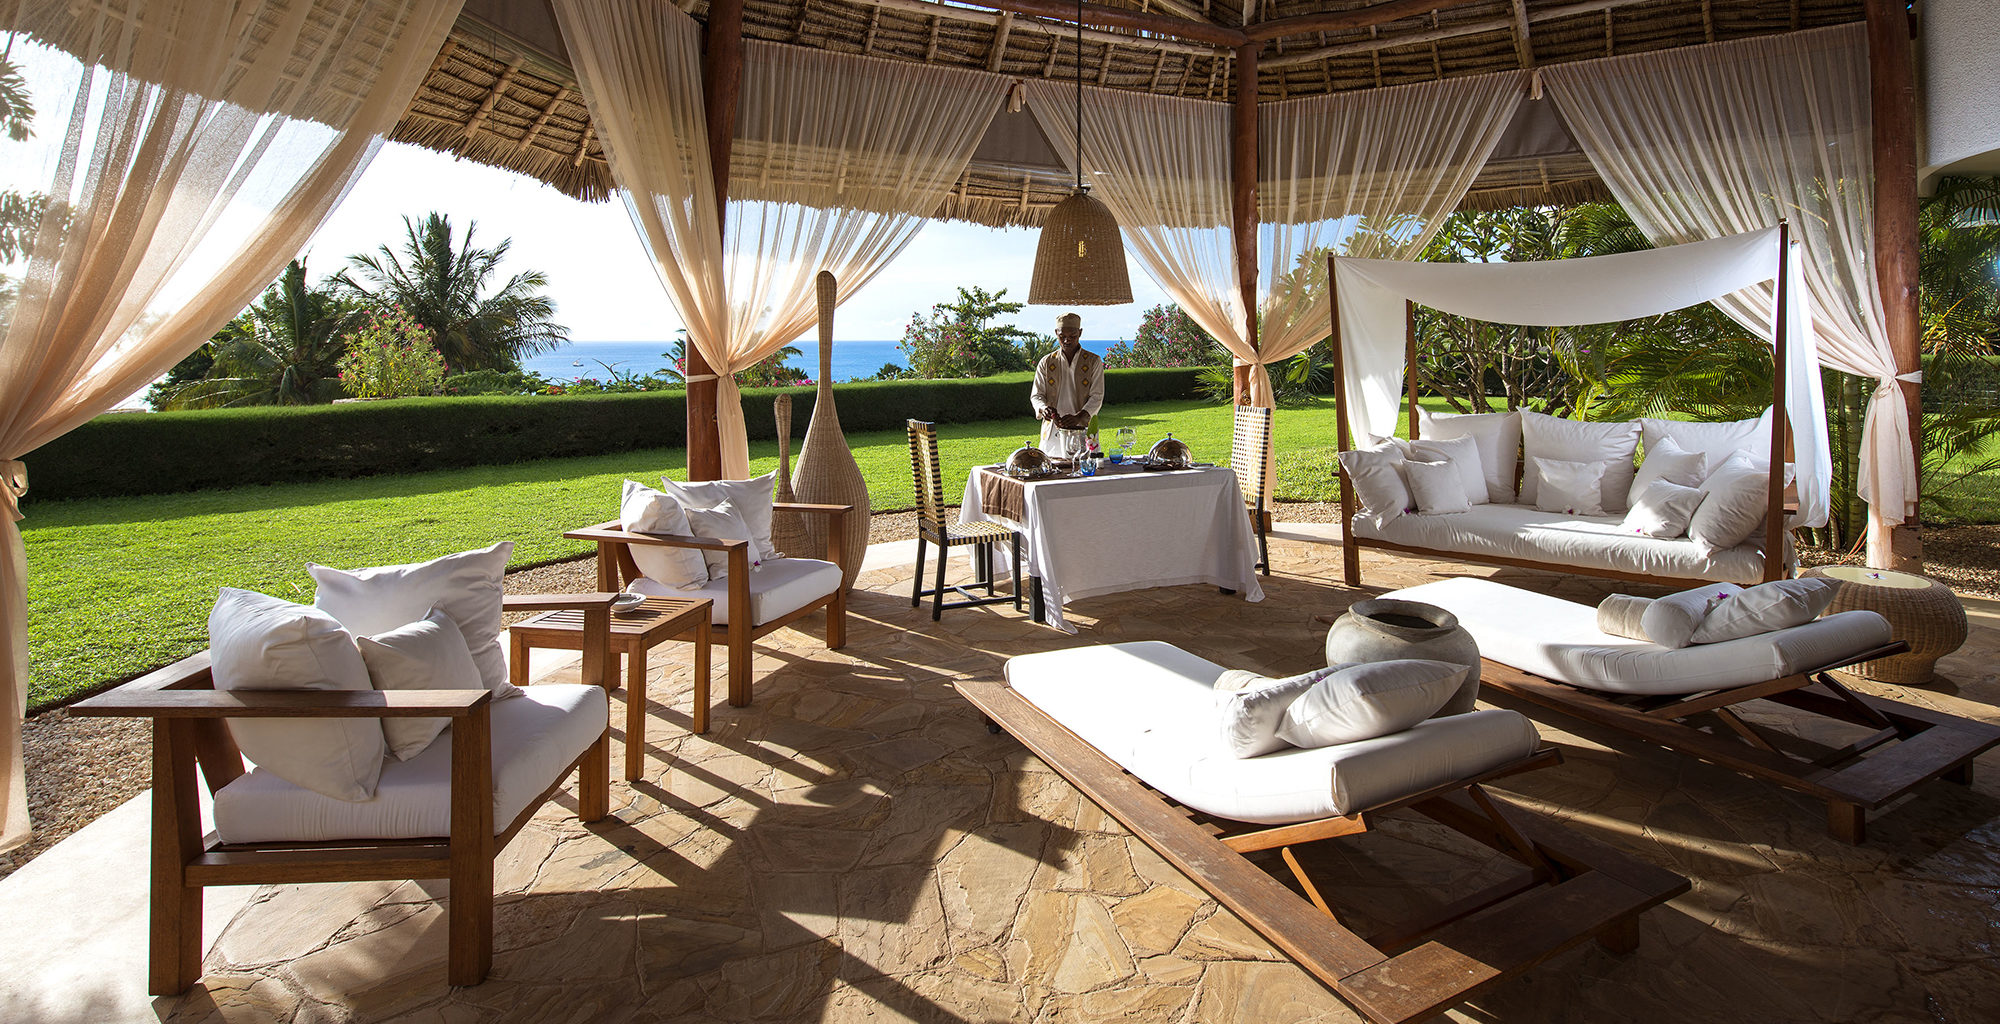 Tanzania-Star-of-the-East-Veranda